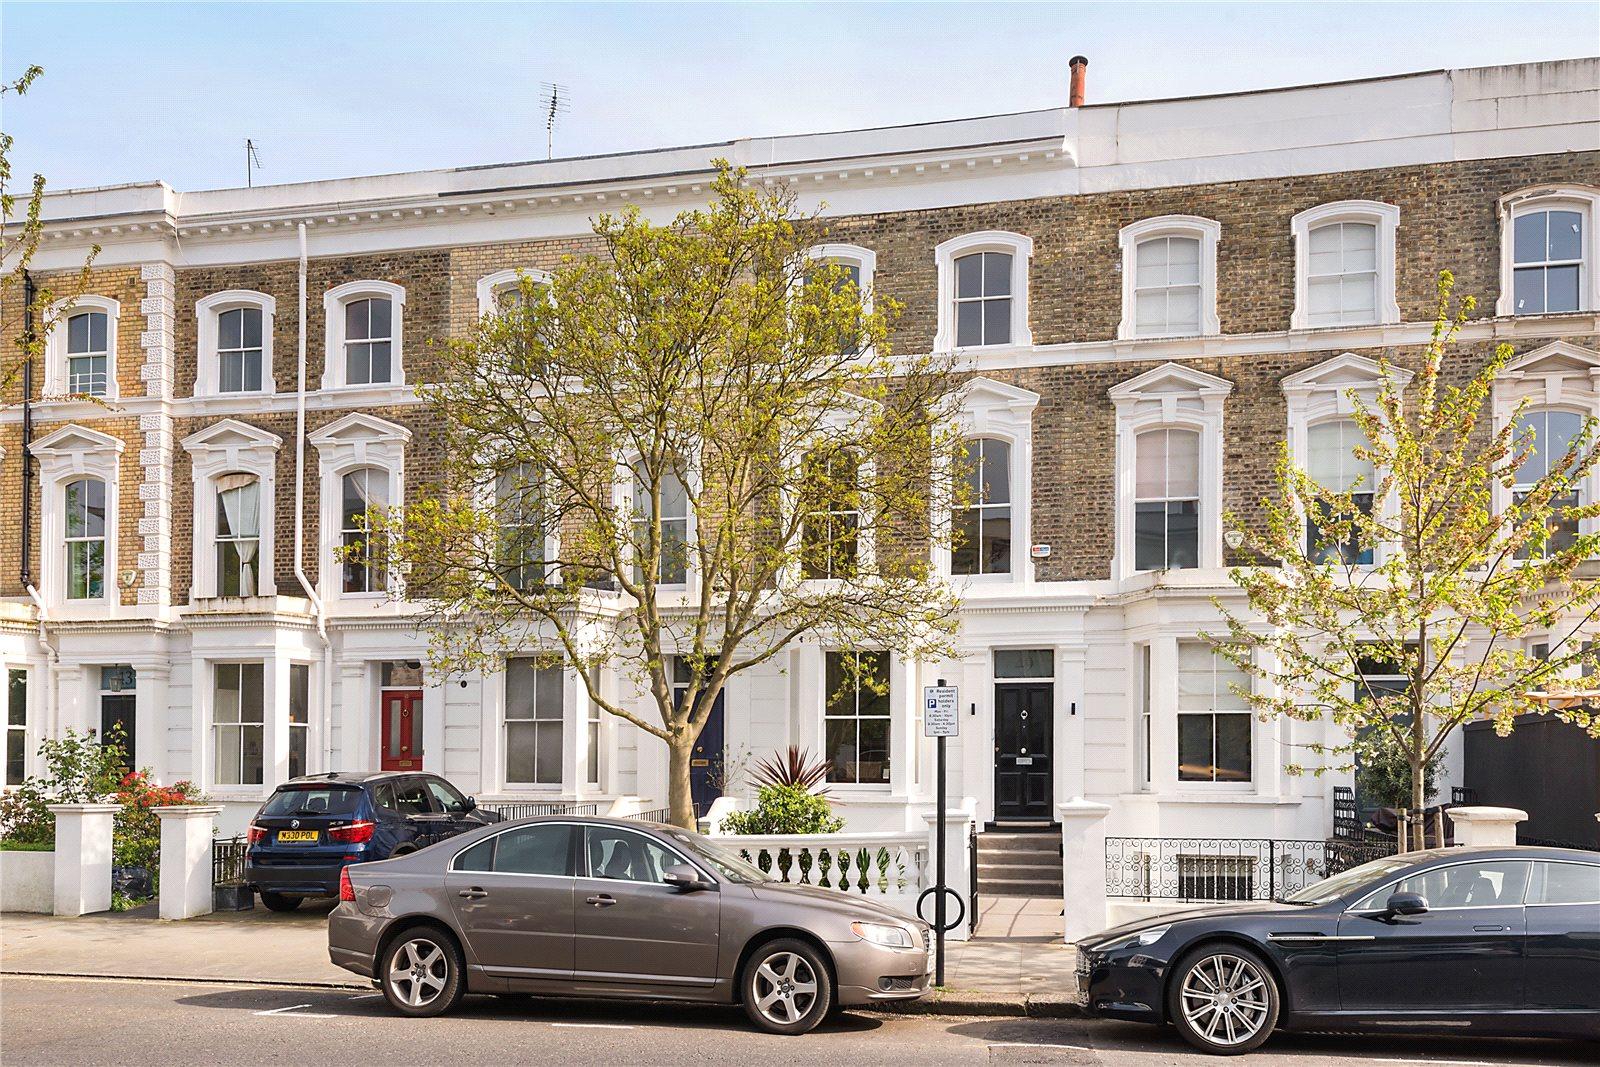 Strutt parker kensington luxury real estate agents in for The kensington house